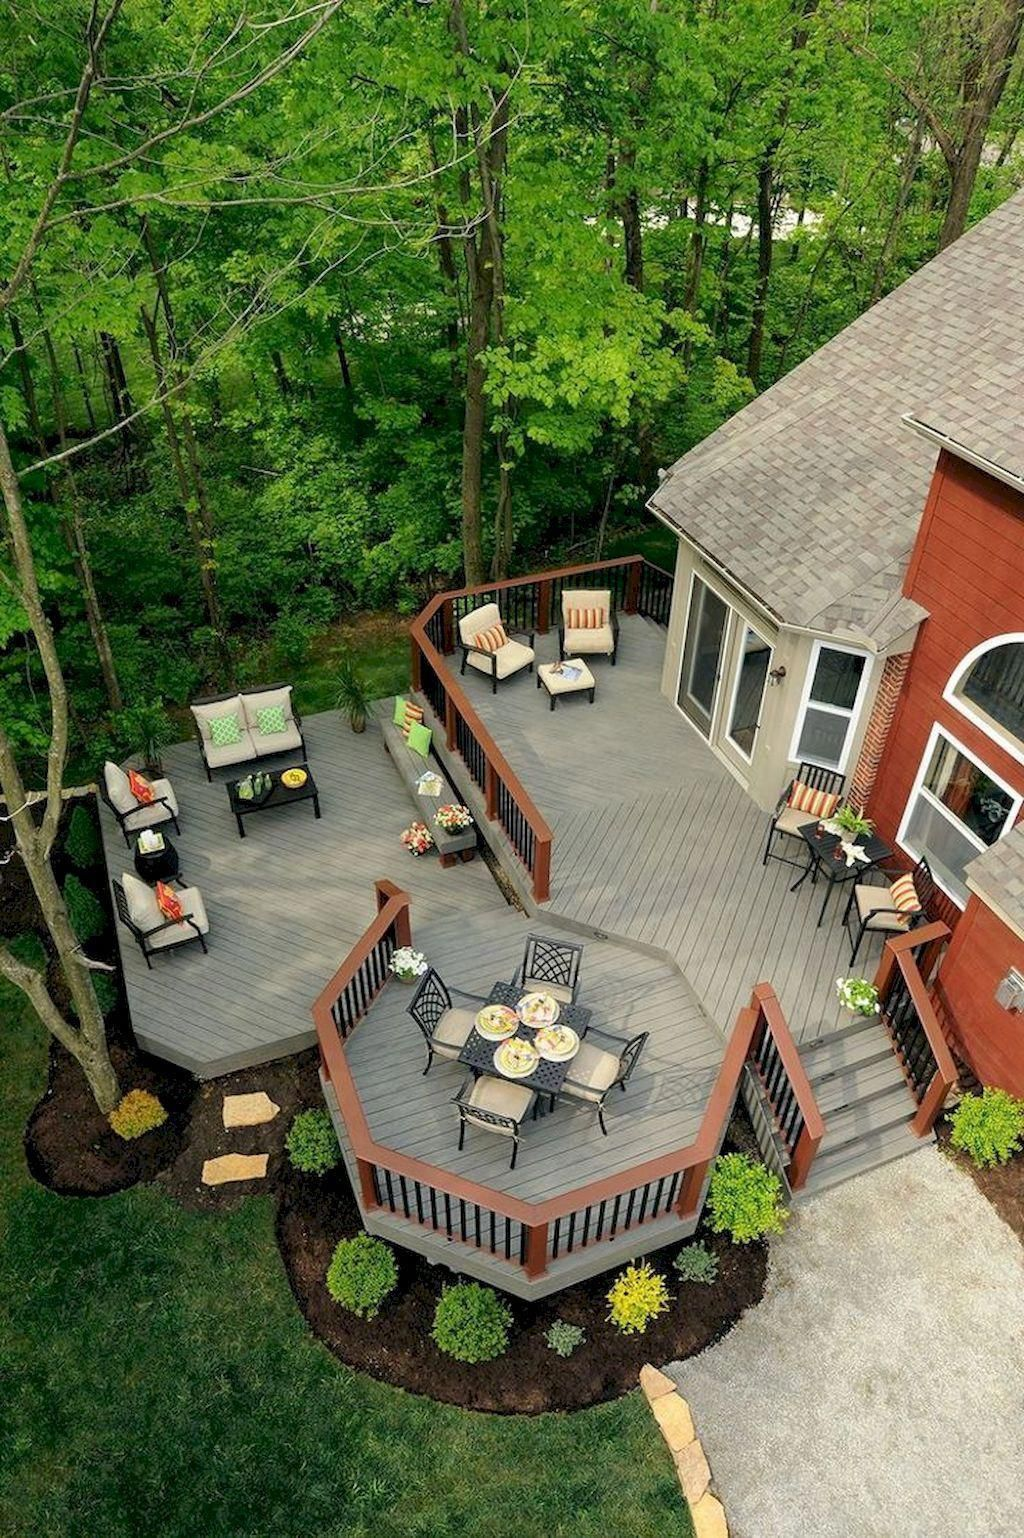 Aspiring Restructured Porch Ideas Visit Our Cozy Backyard Backyard Decks Backyard House backyard deck ideas